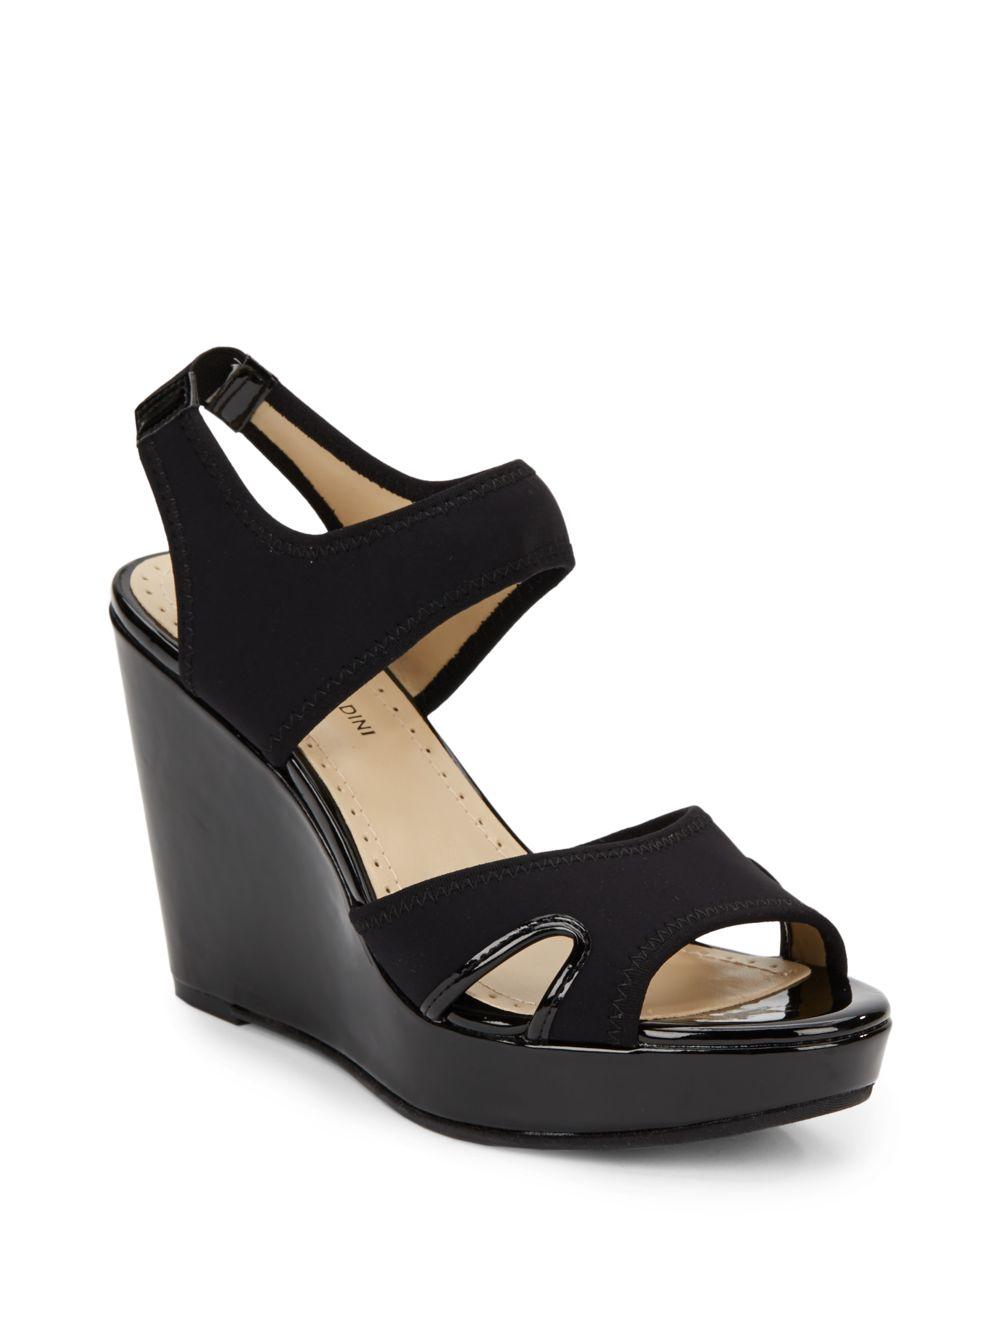 eedc1c5962b Lyst - Adrienne Vittadini Clover Stretch Platform Wedge Sandals in Black